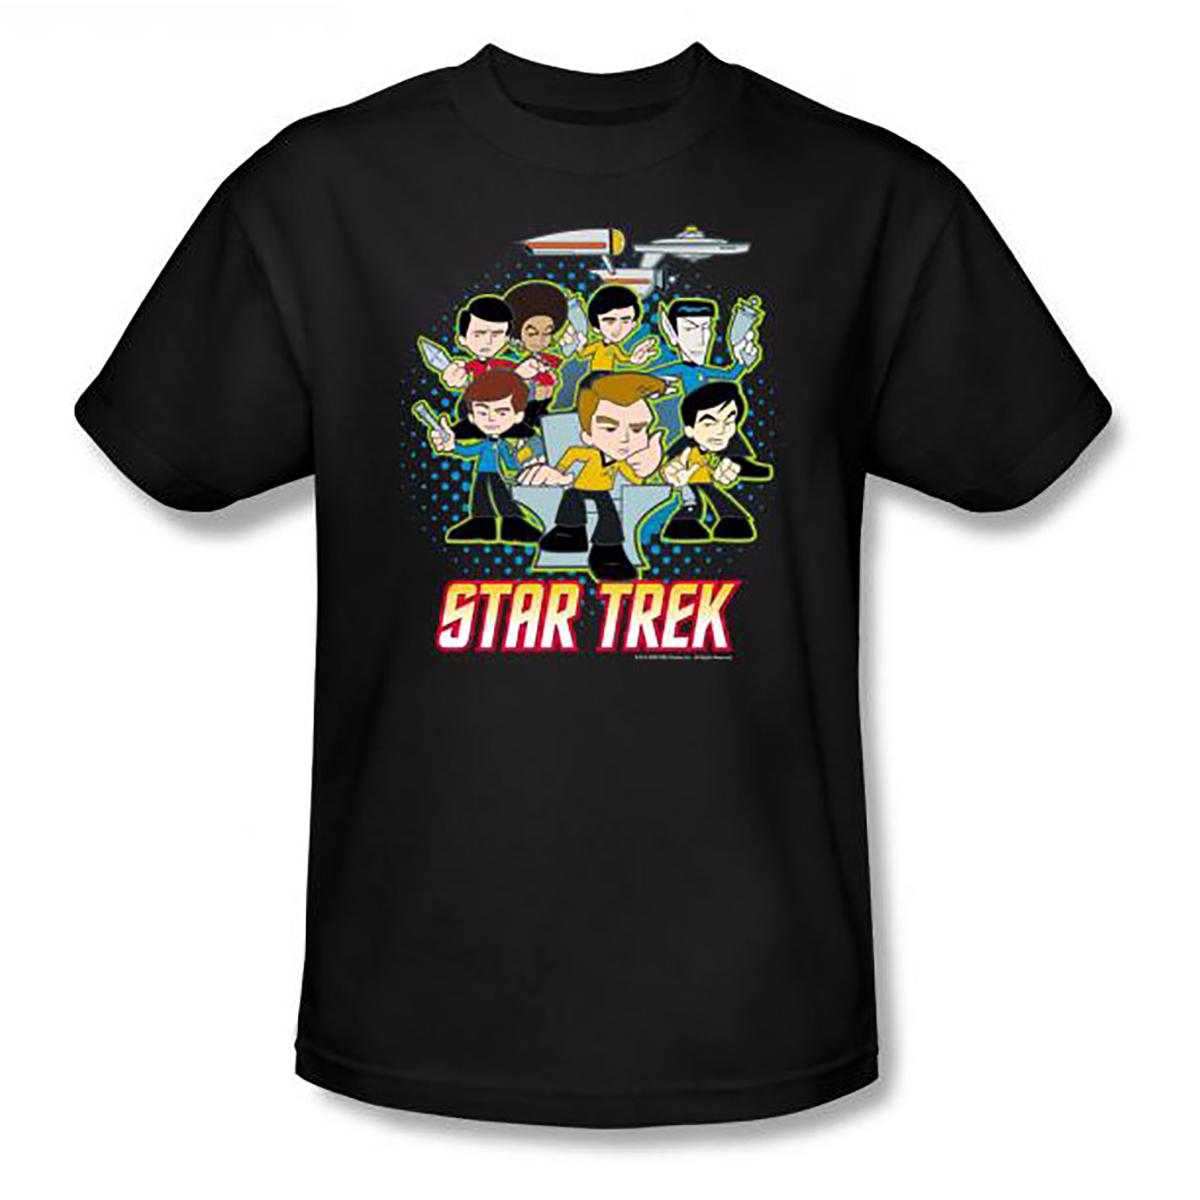 Star Trek Cartoon Crew T-Shirt